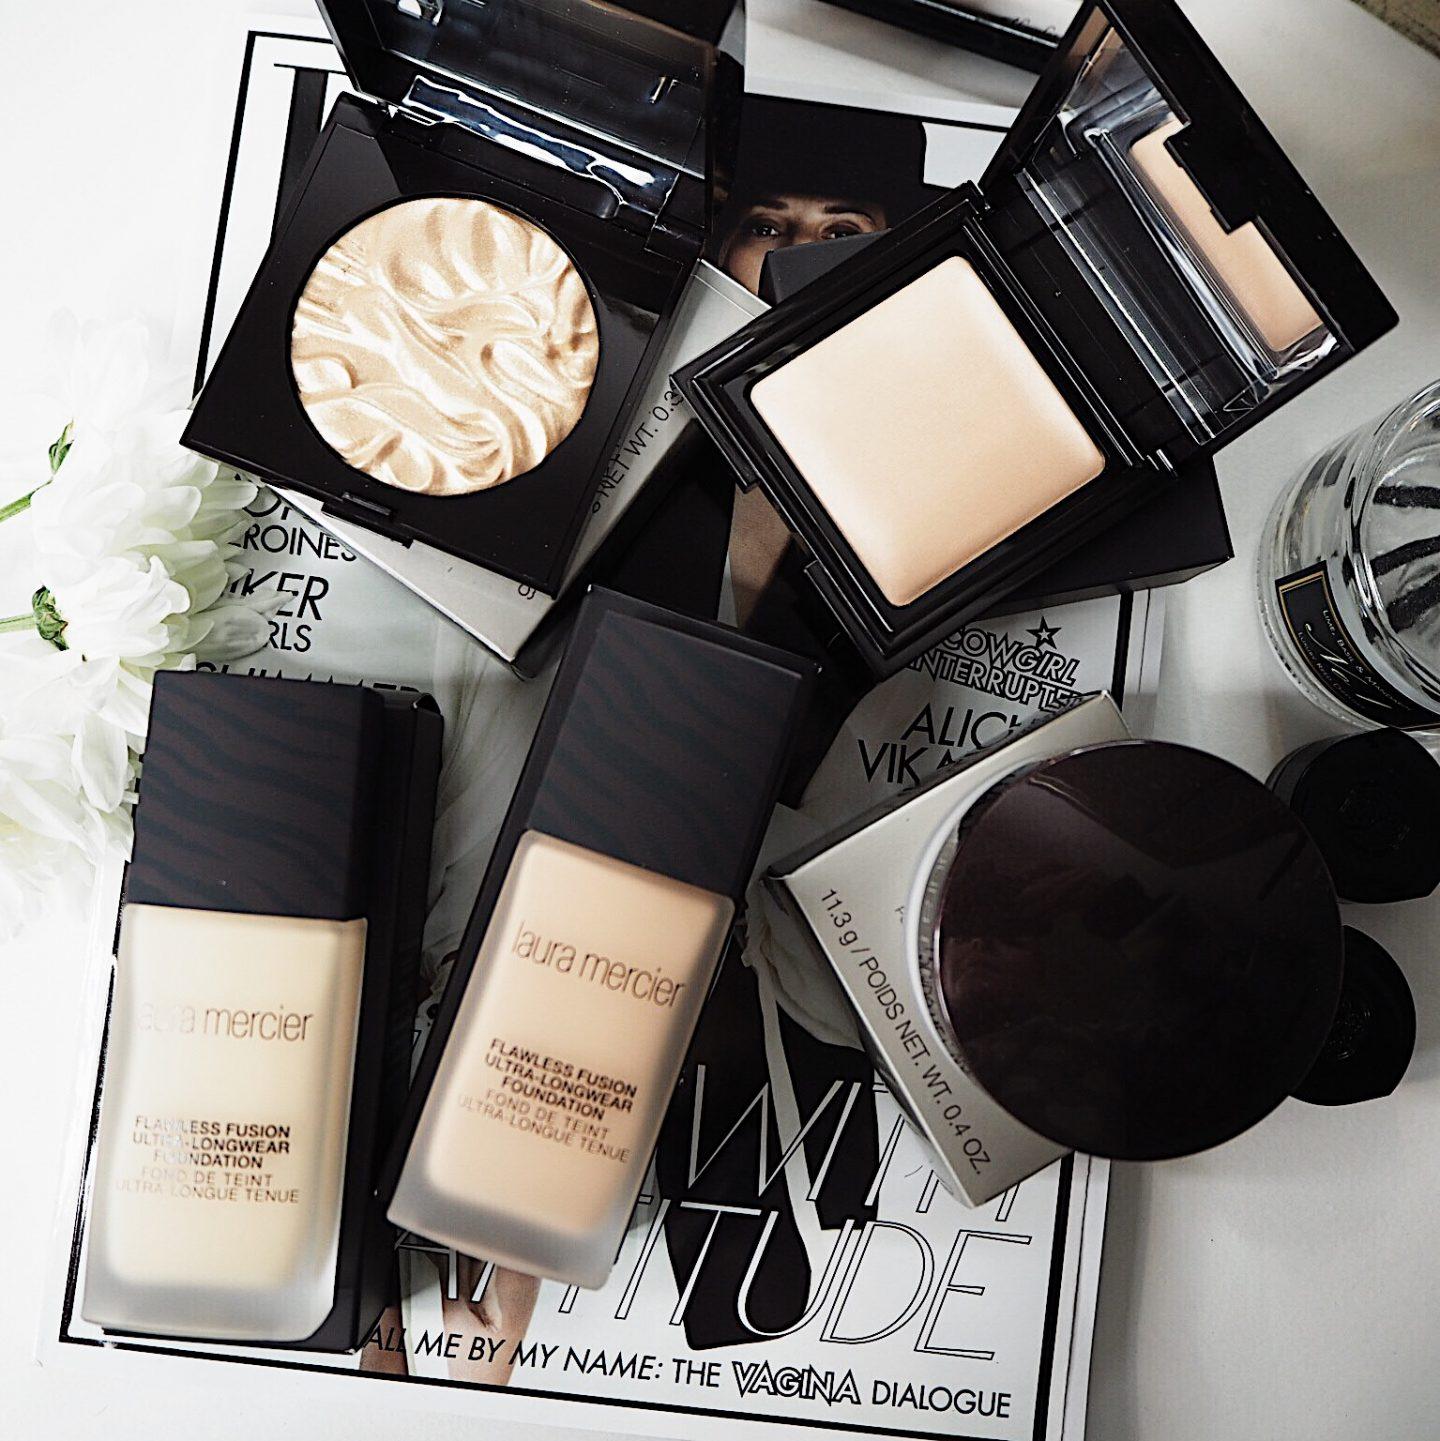 Laura Mercier – Brand Focus Perfect Skin